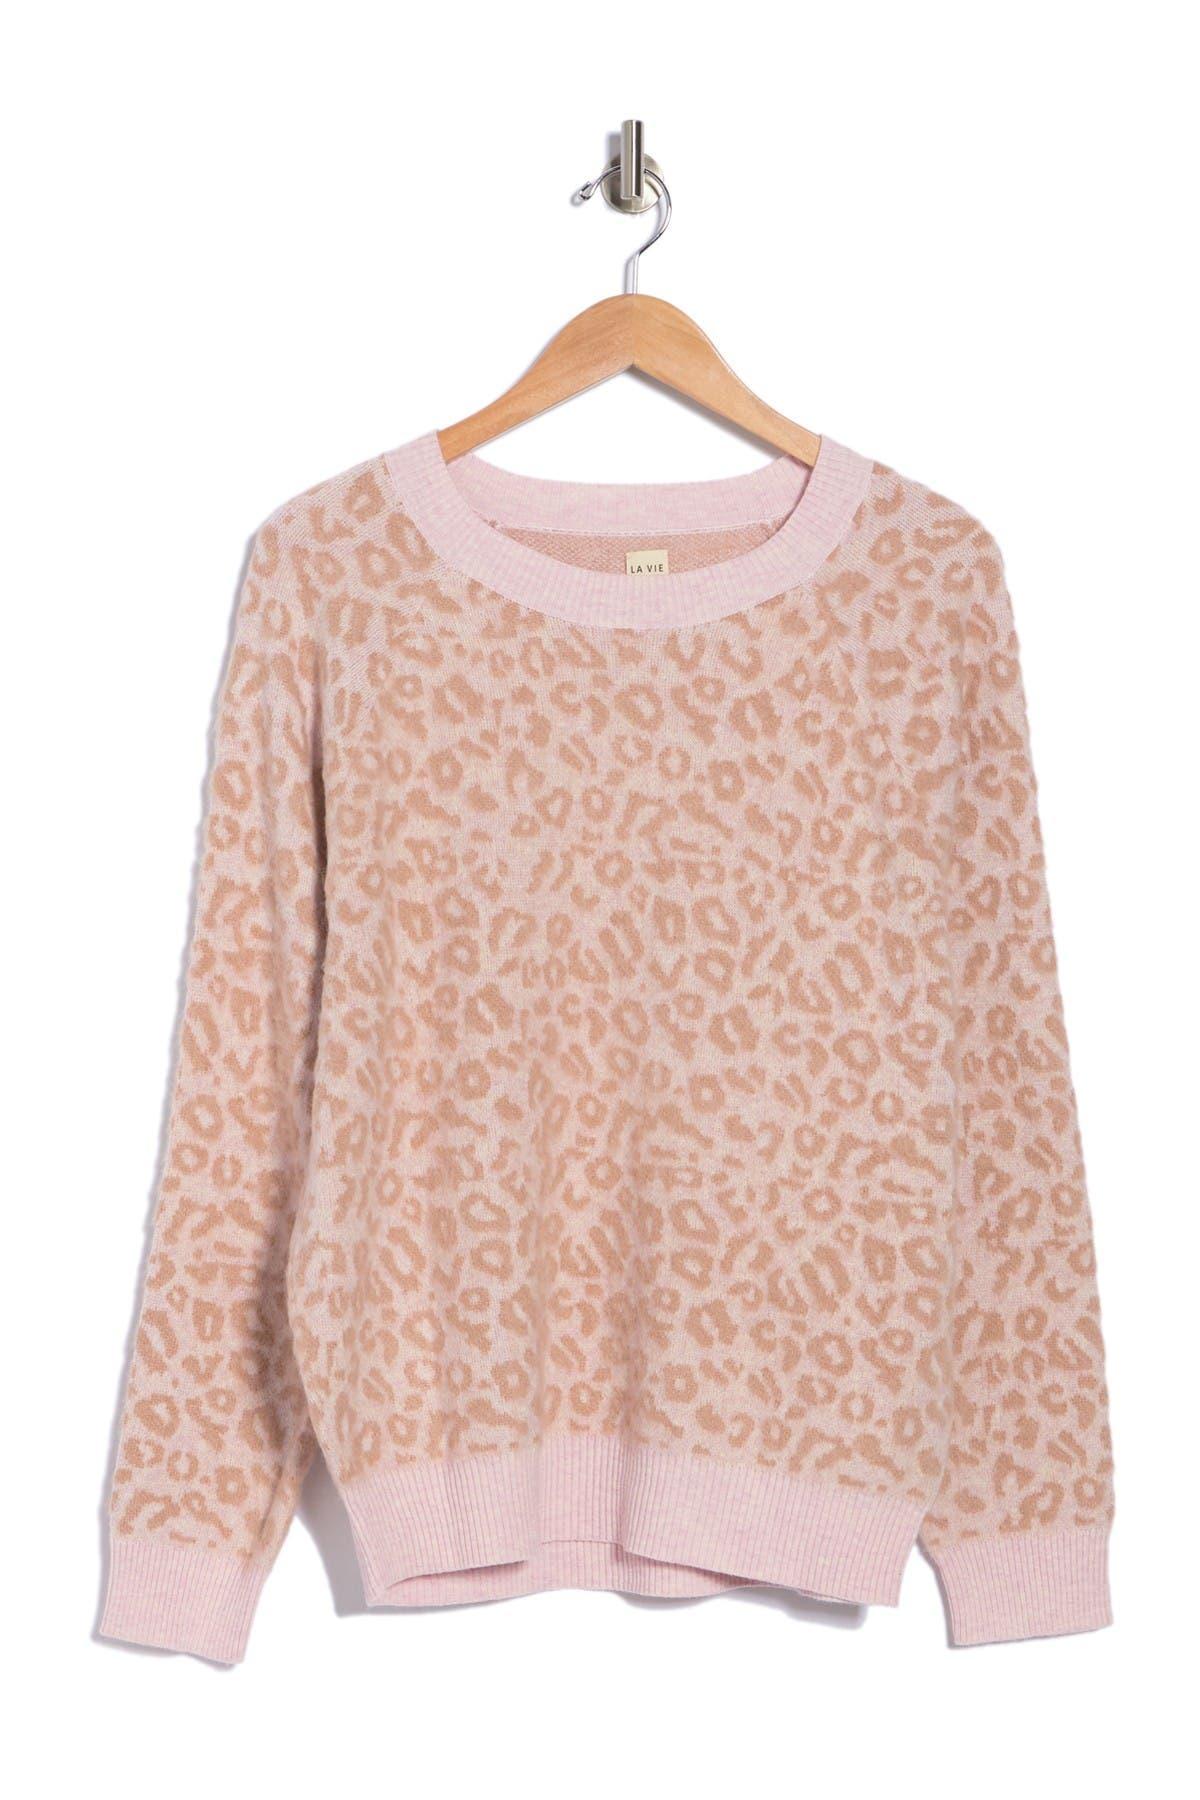 Image of Rebecca Taylor Leopard Print Jacquard Sweater